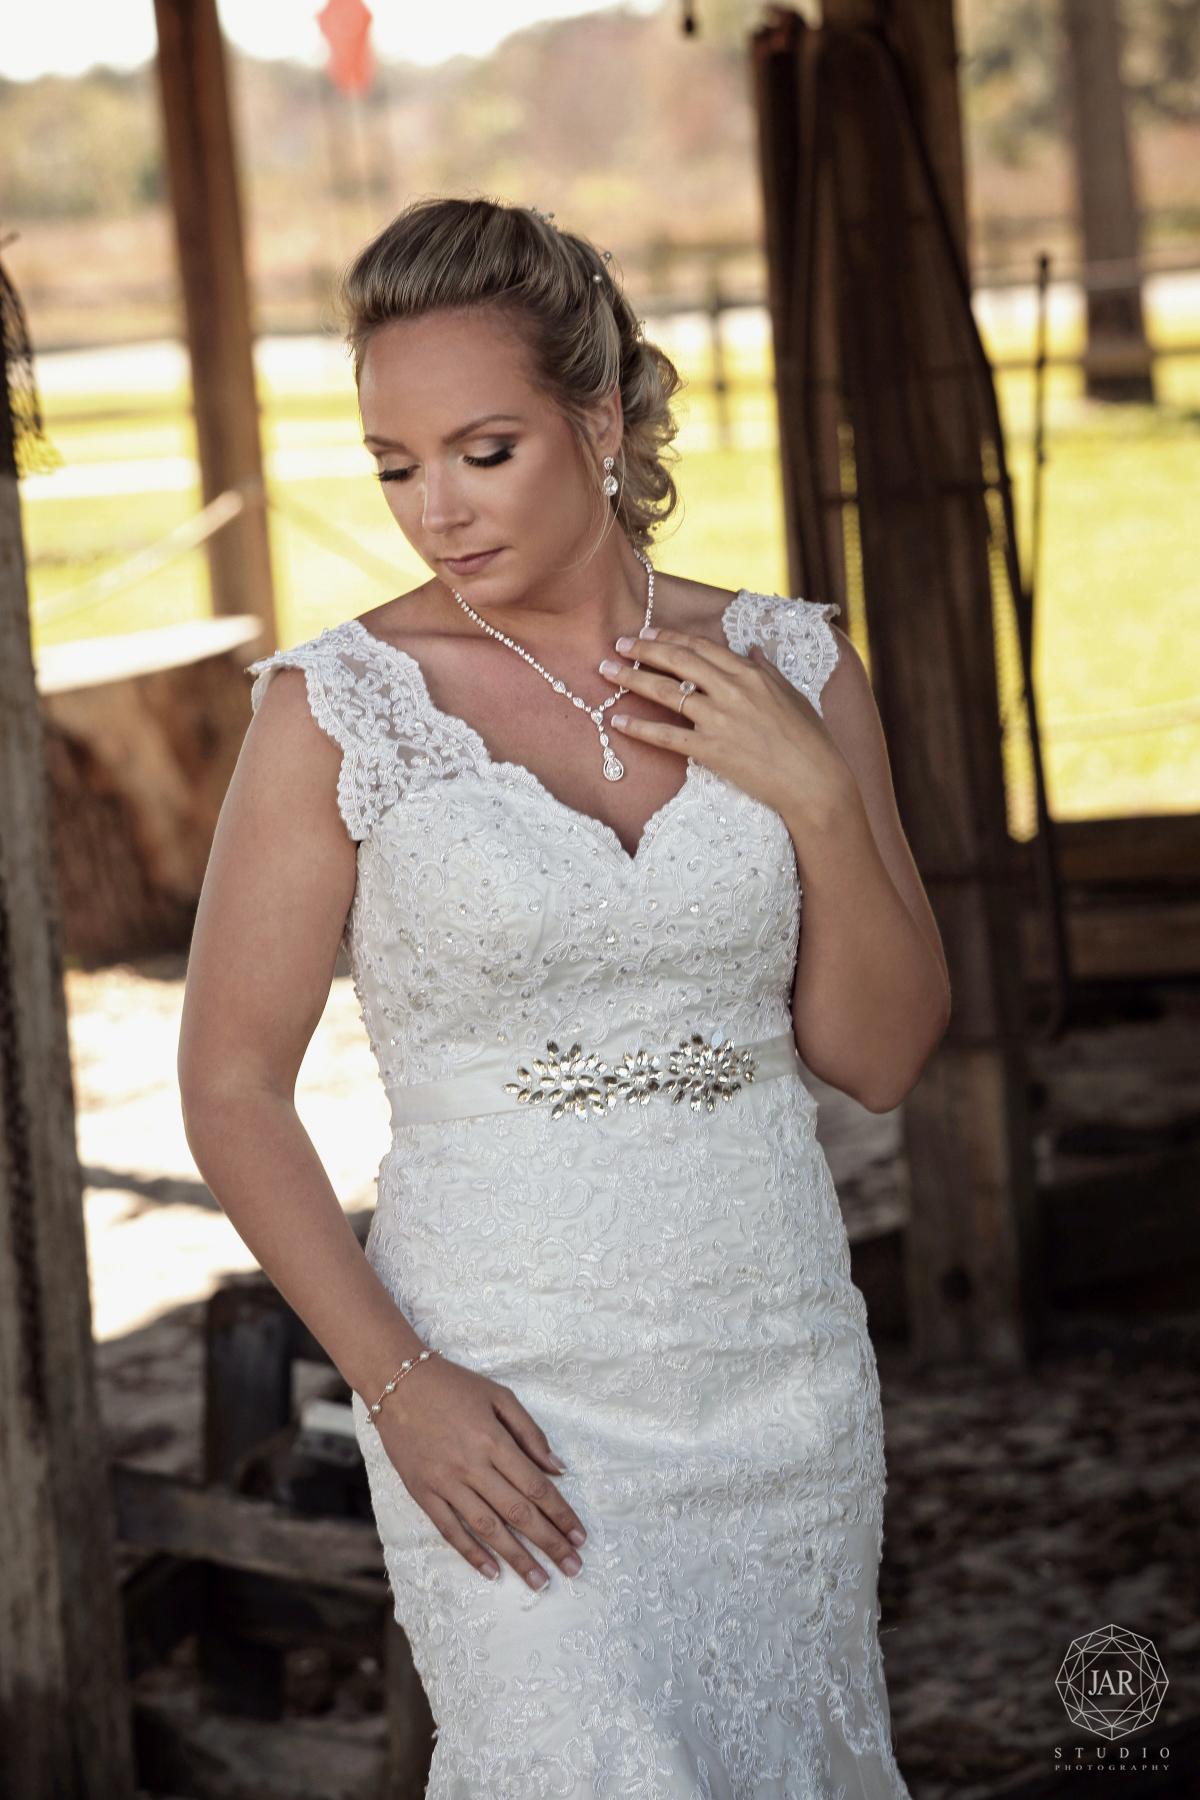 02-wedding-dress-beautiful-jarstudio.JPG